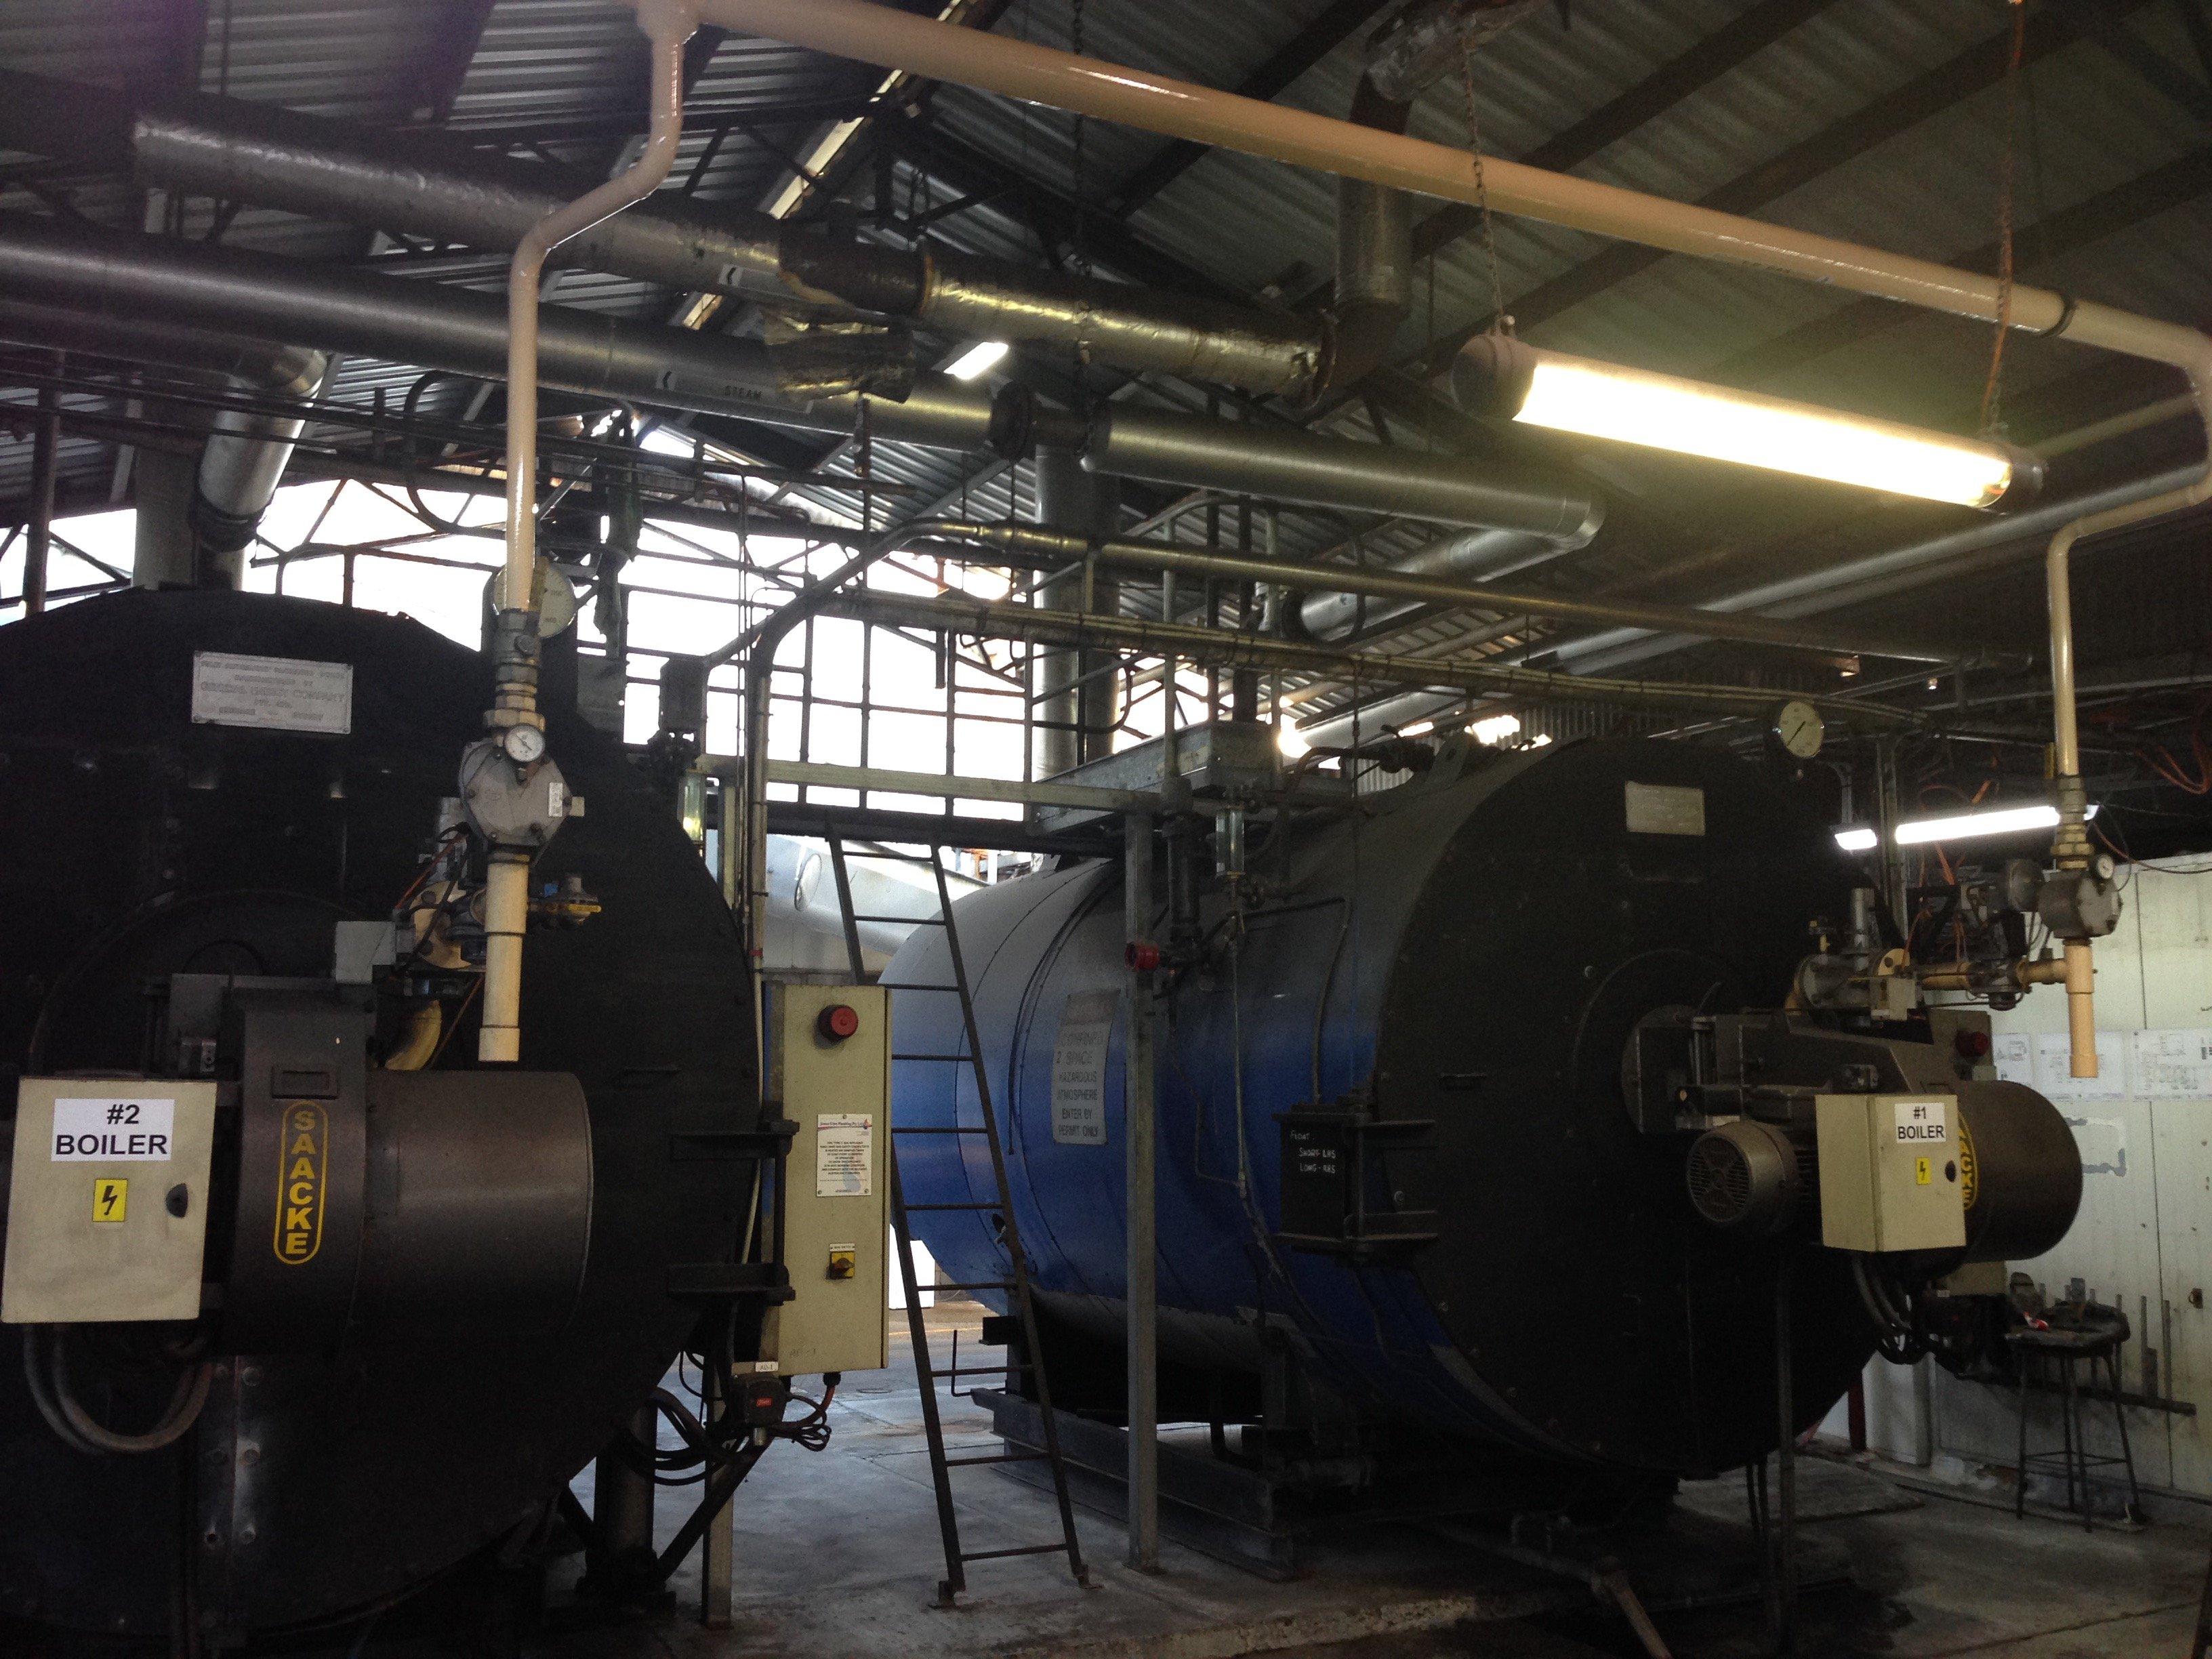 Boiler Plant rooms